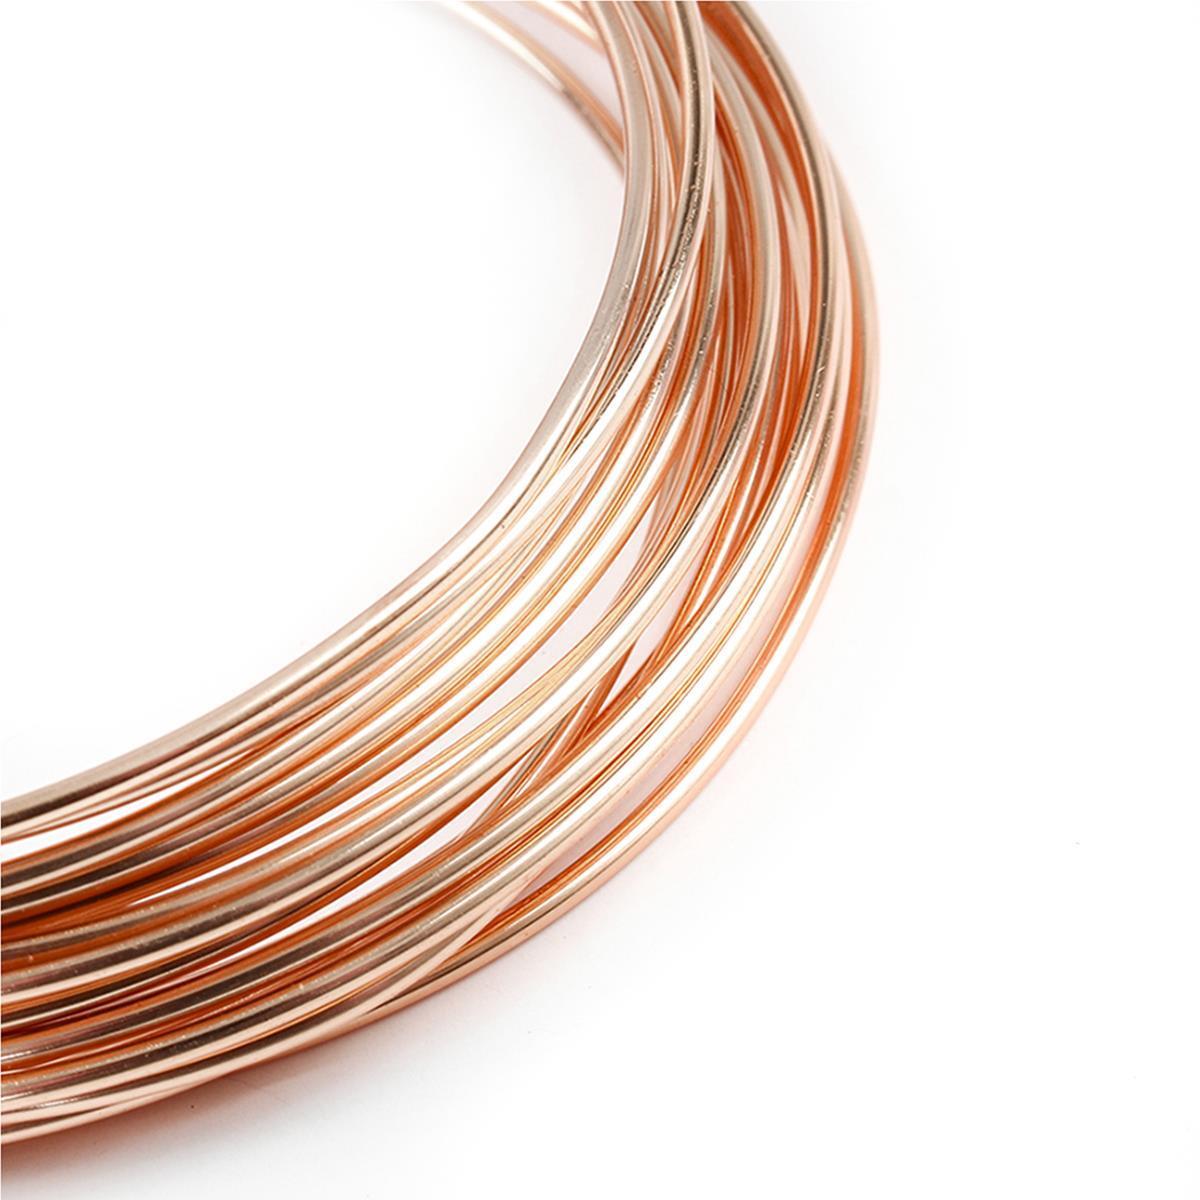 Copper Wire Product : Copper round wire mm m jewellerymaker